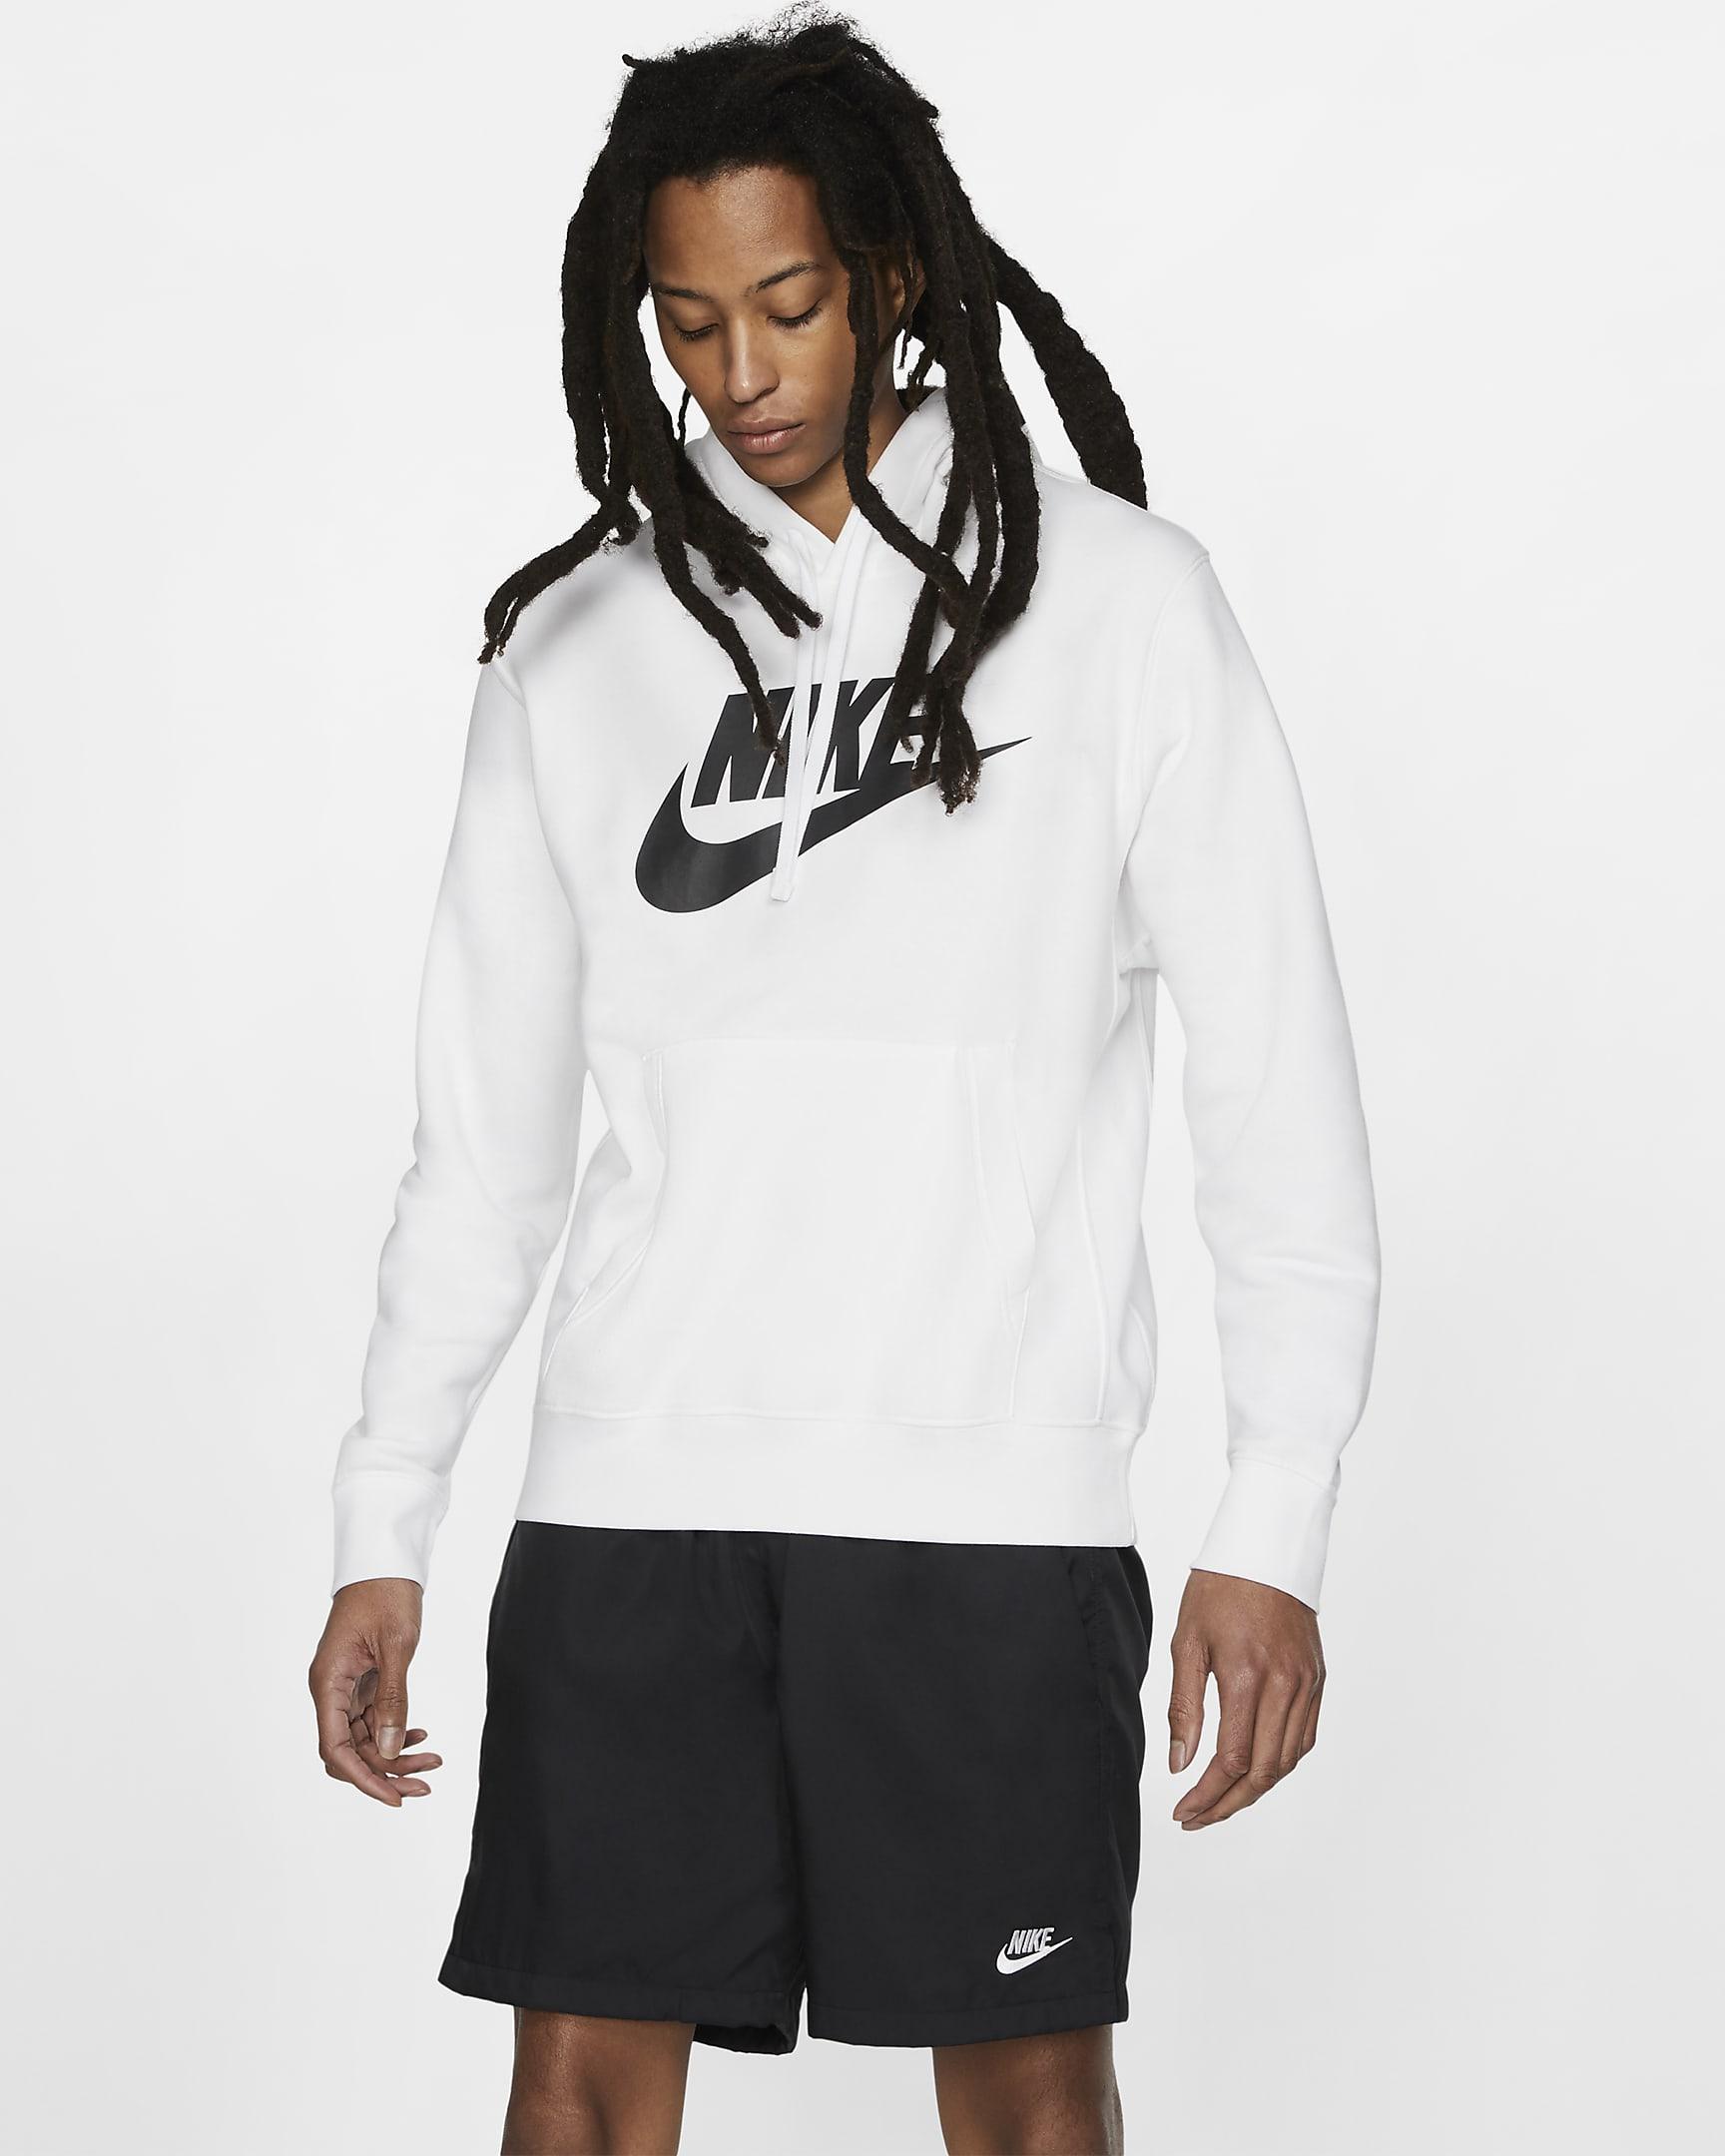 nike-sportswear-club-fleece-mens-graphic-pullover-hoodie-R9w74B.png